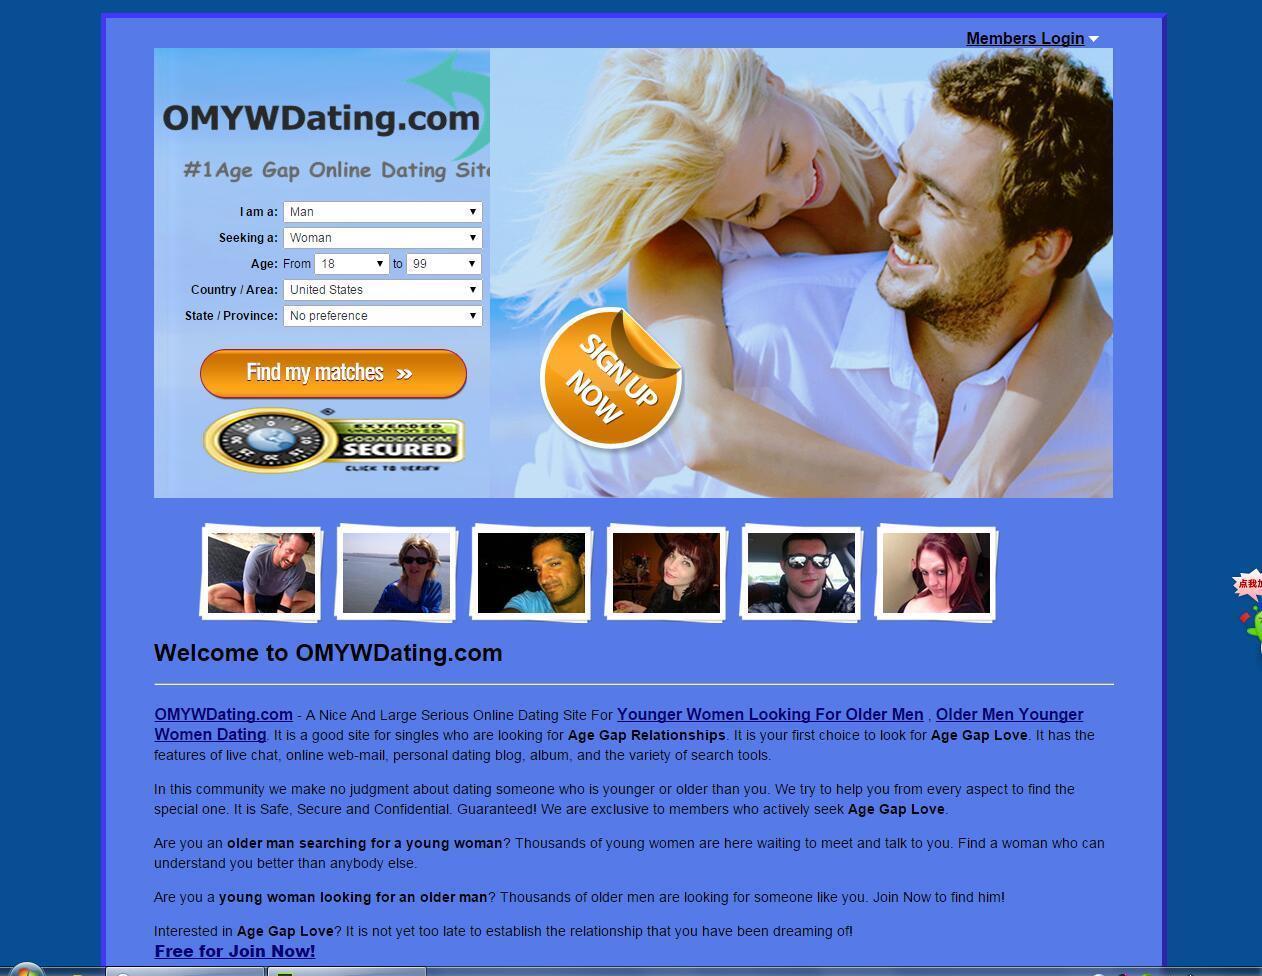 dating site women seeking older men